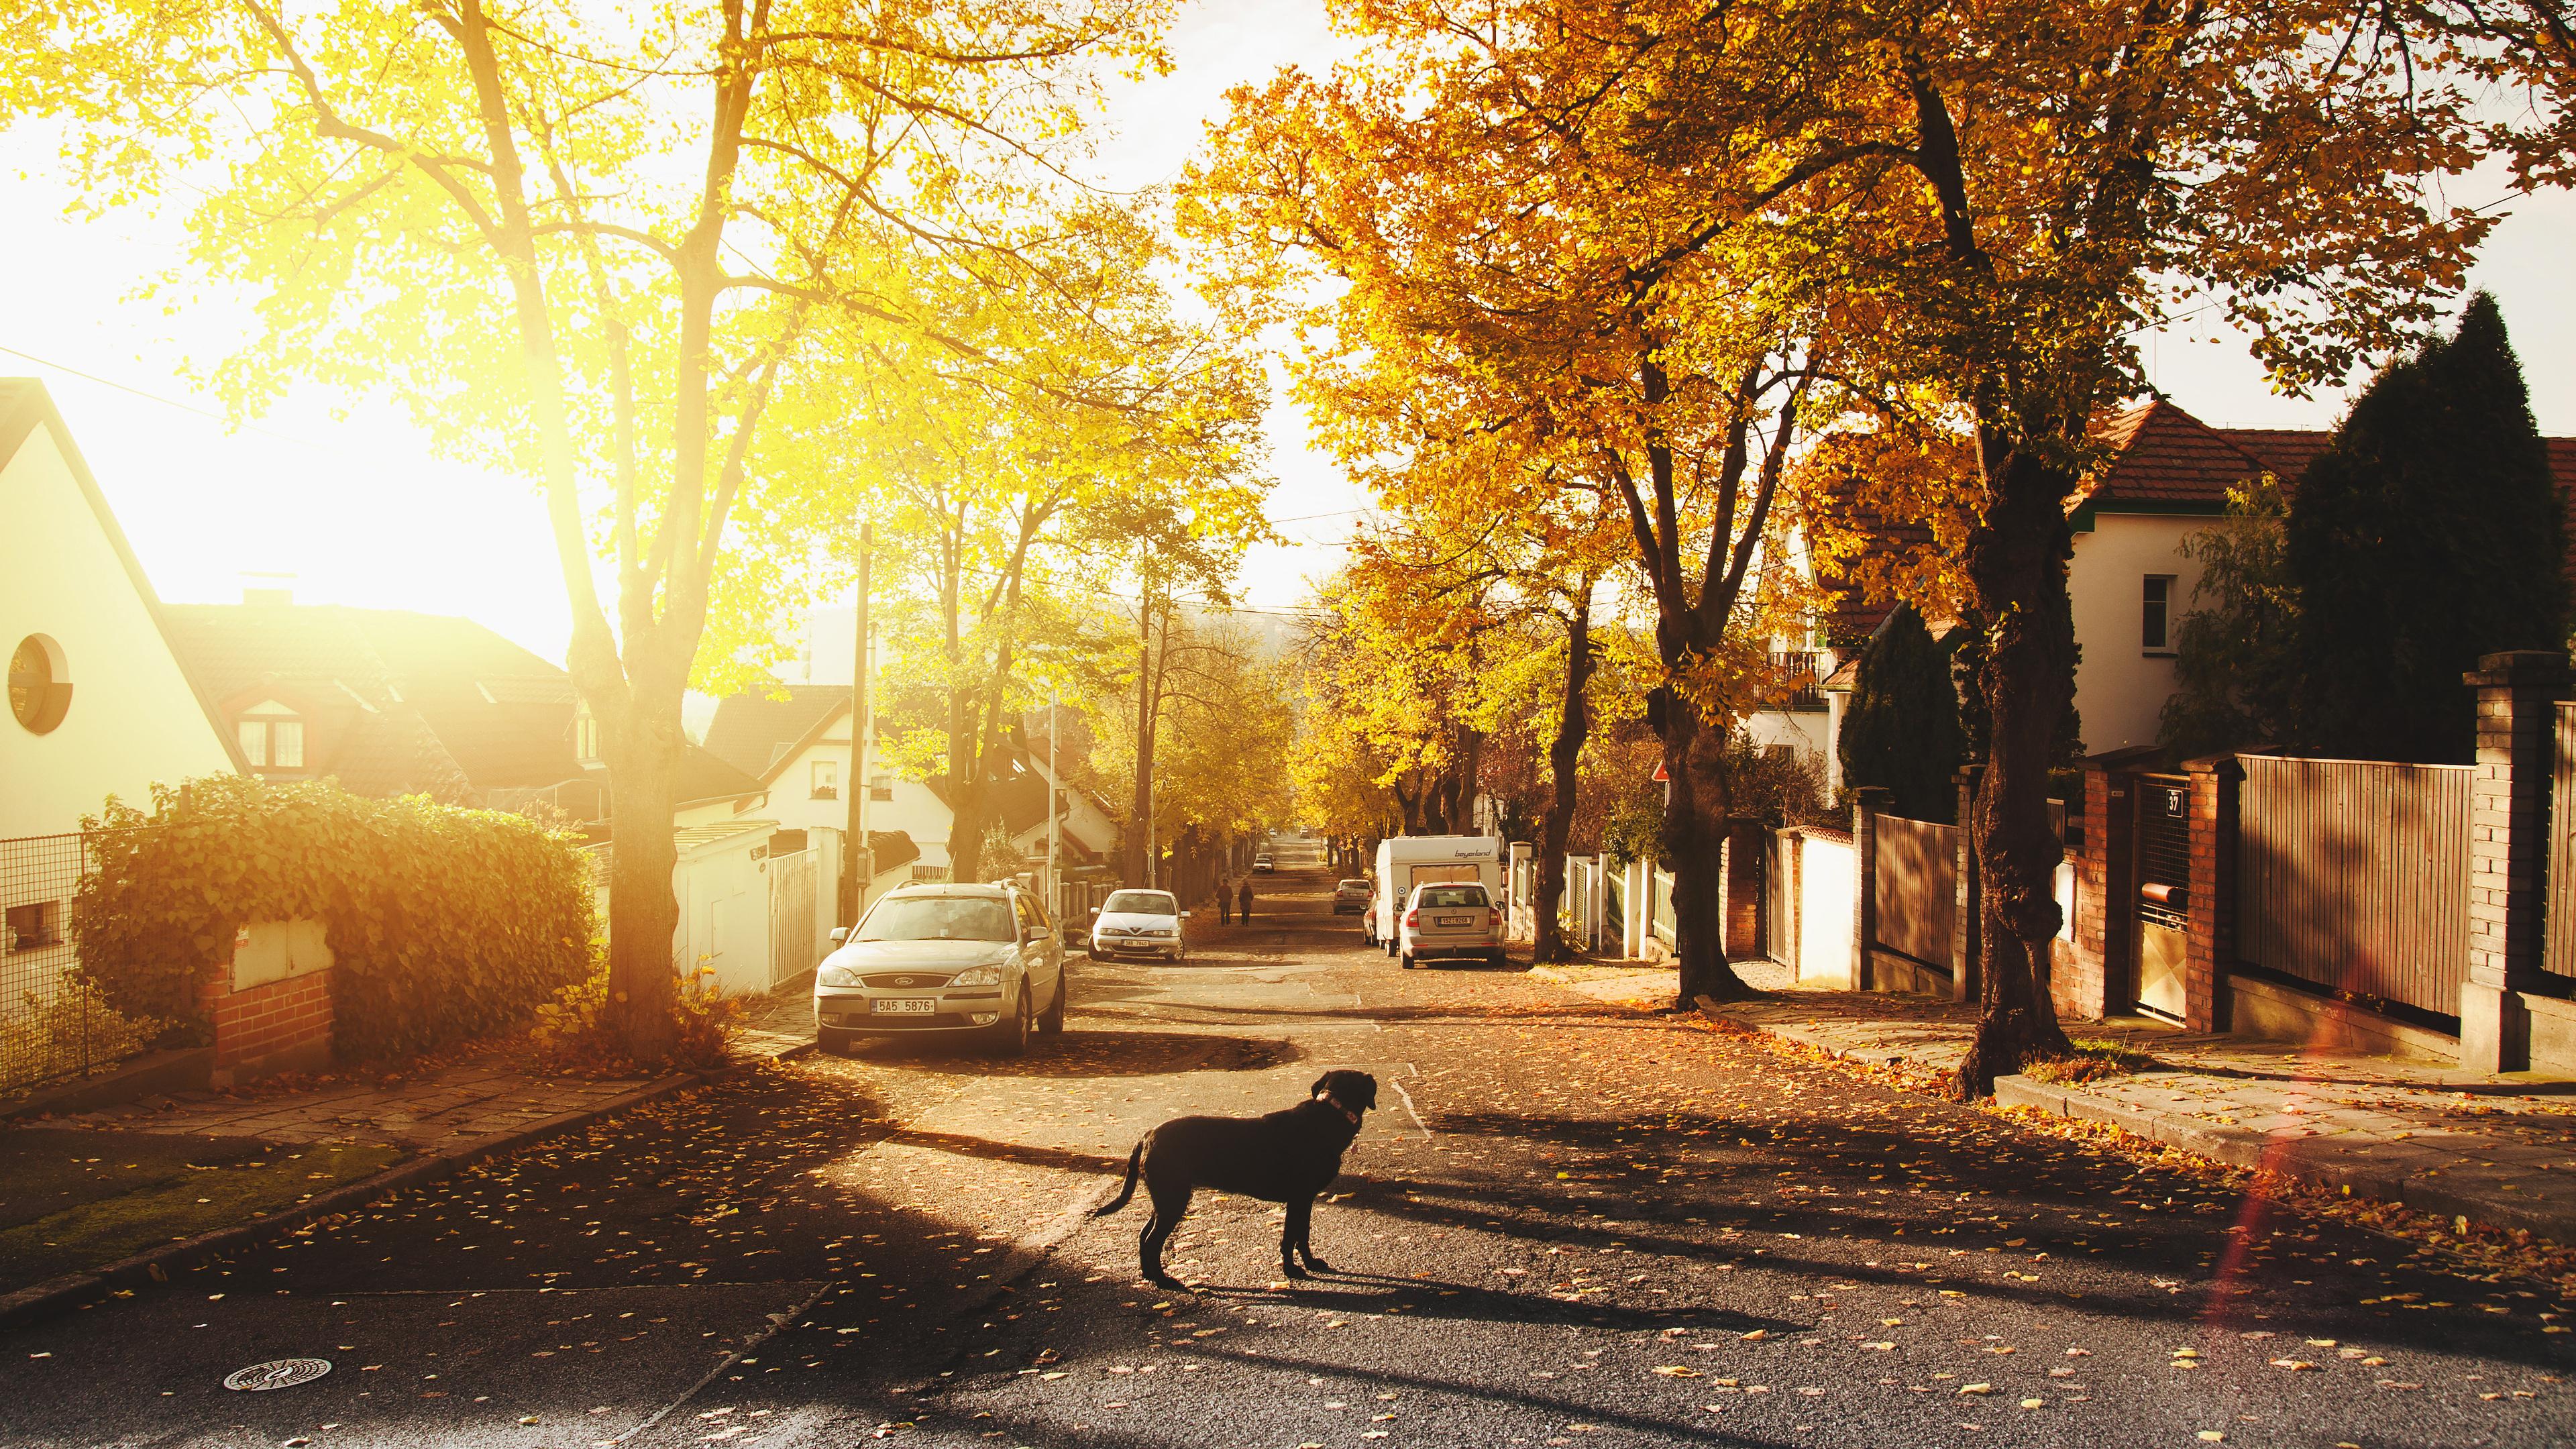 dog-on-concrete-road-homes-trees-sunlights-4k-i6.jpg